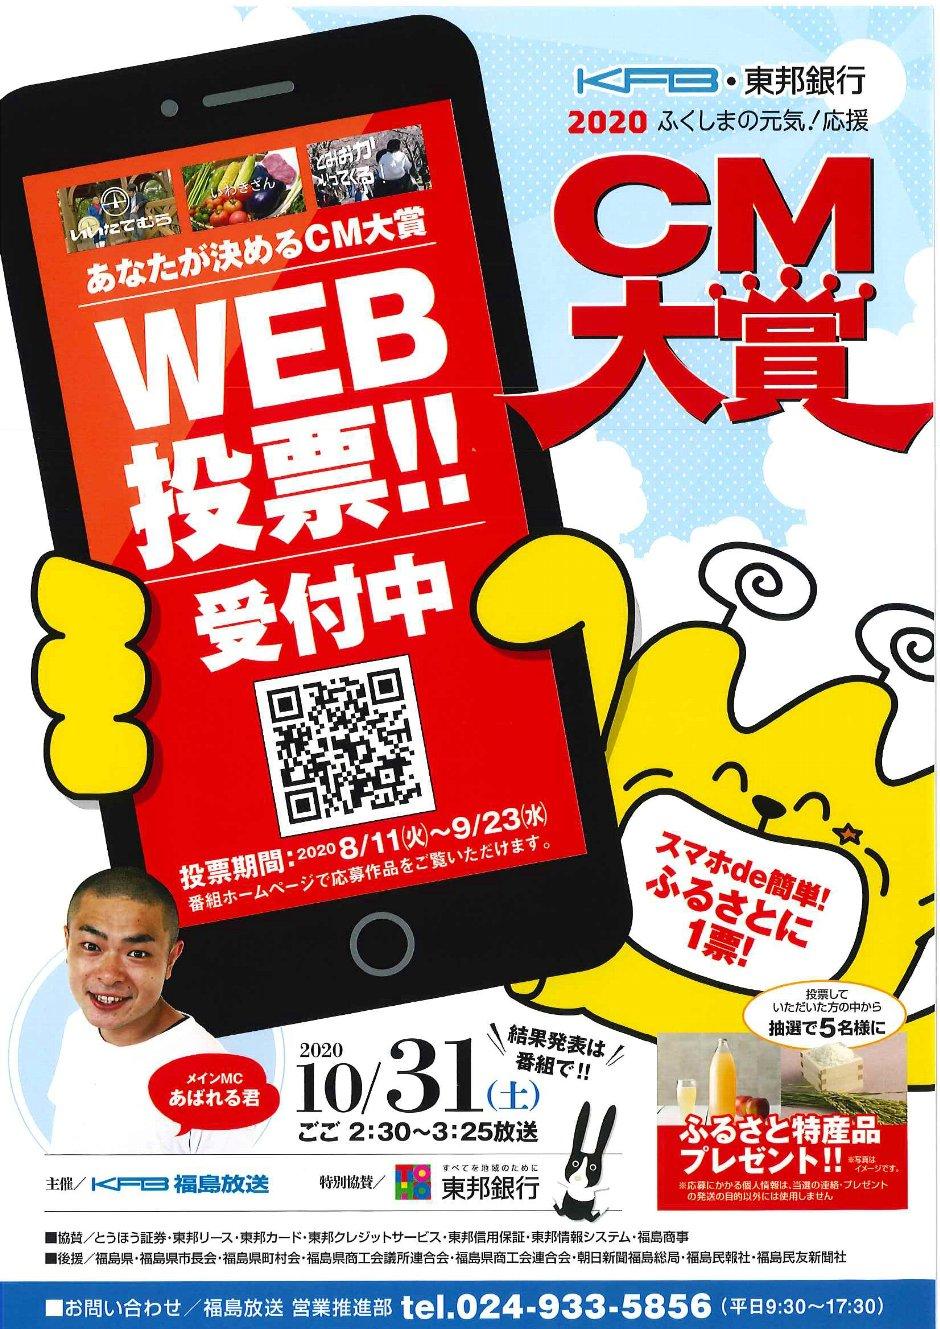 KFB福島放送『CM大賞2020』WEB投票